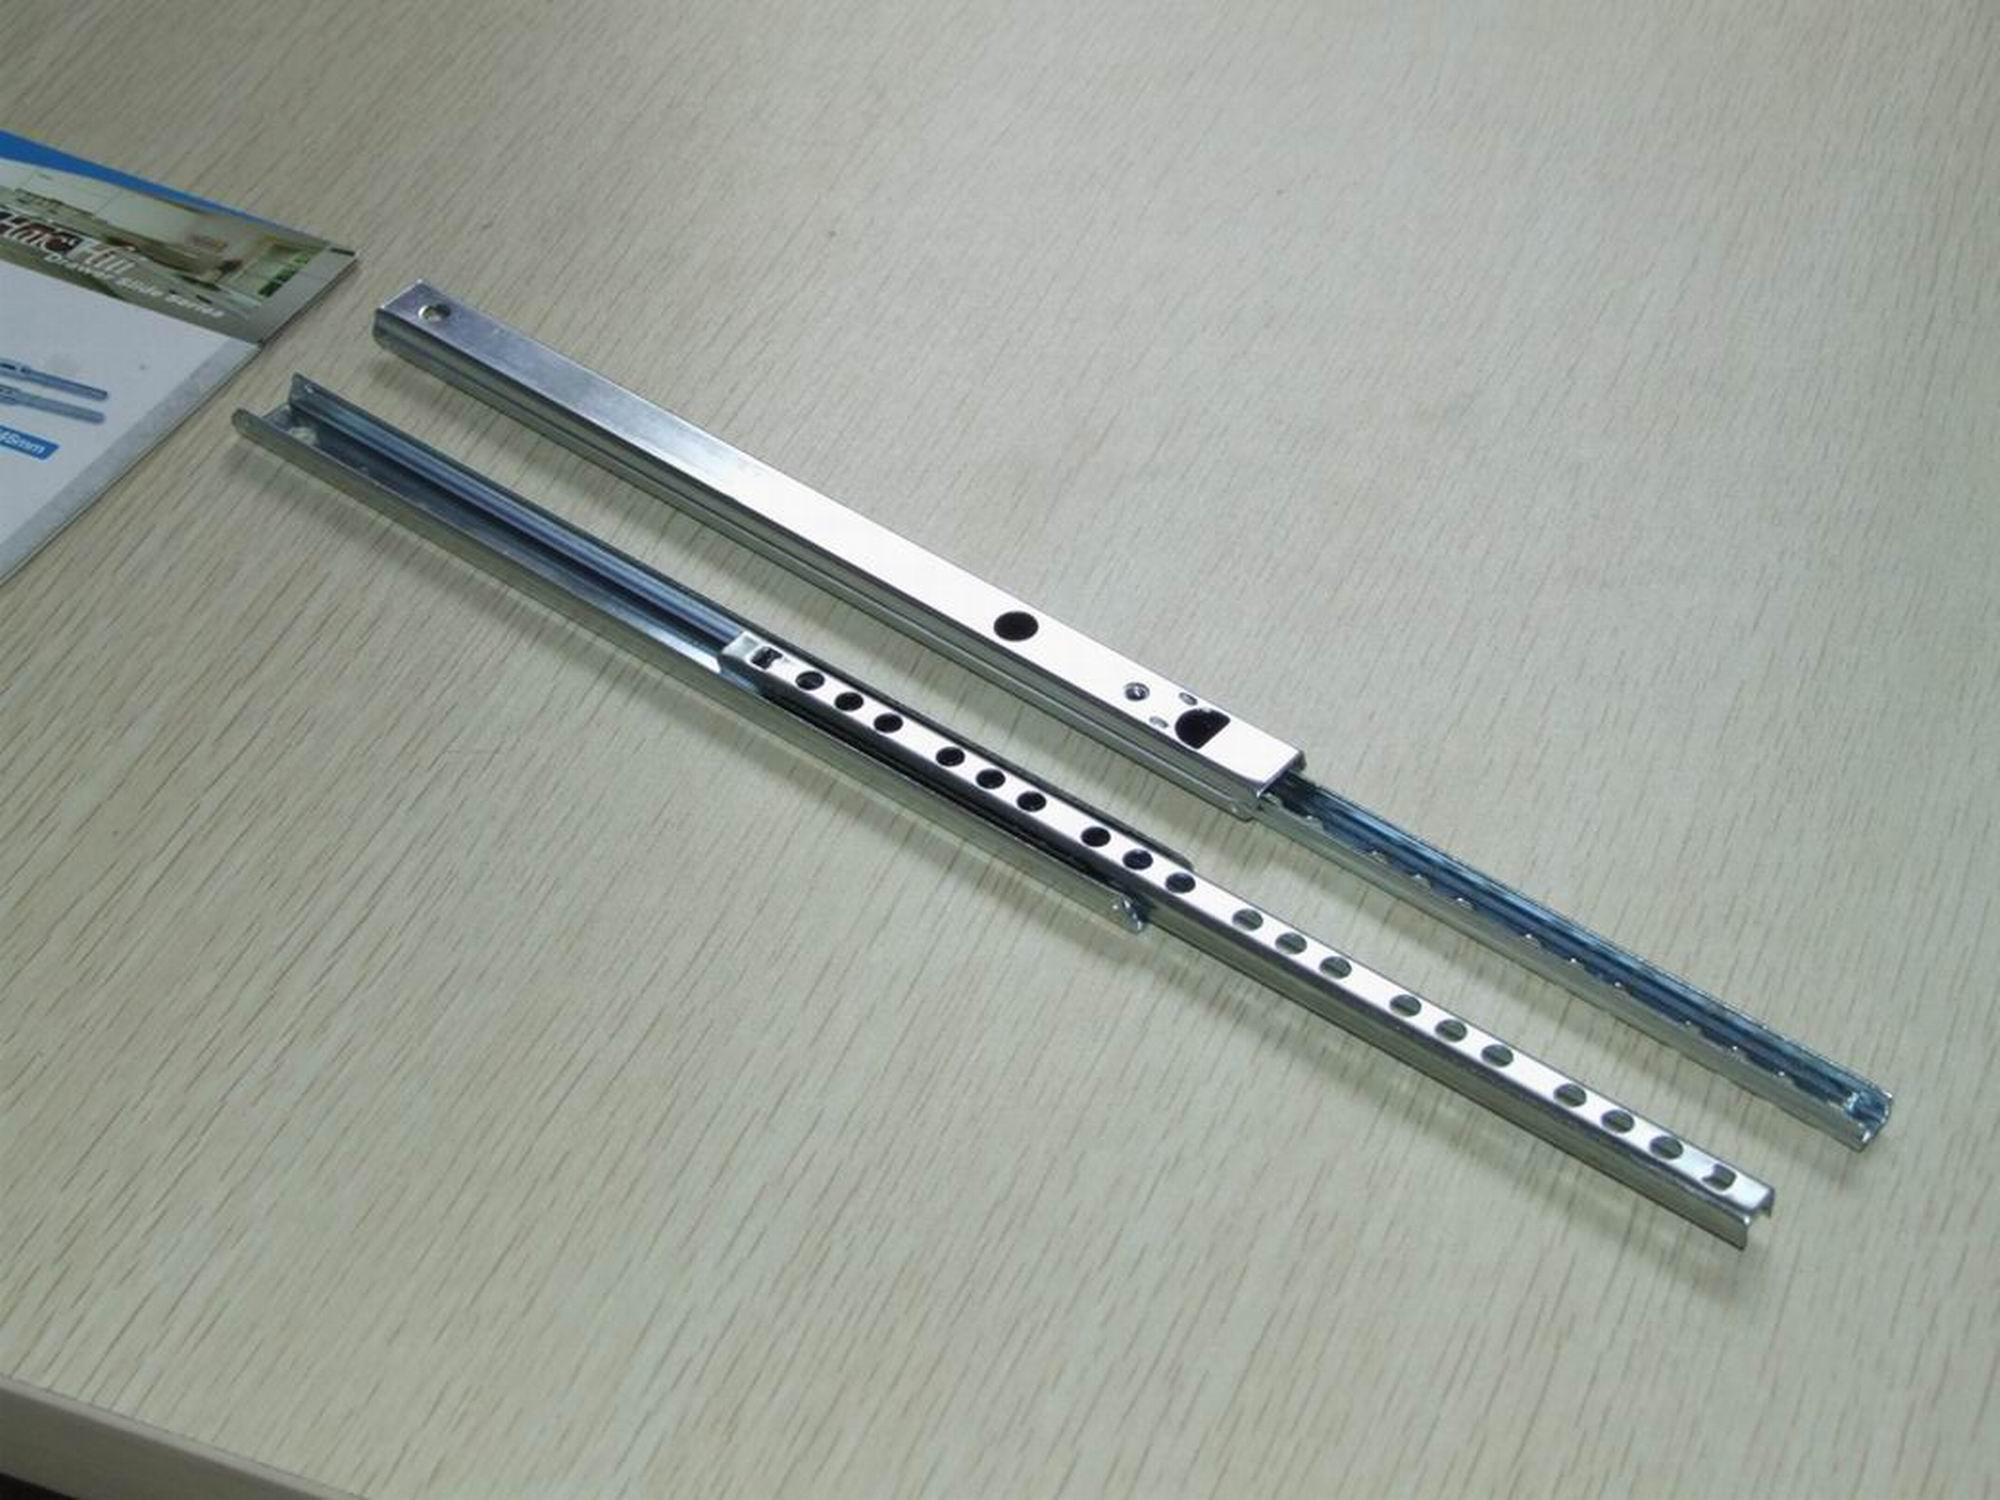 shaoxing pengsheng metal strip co.,ltd